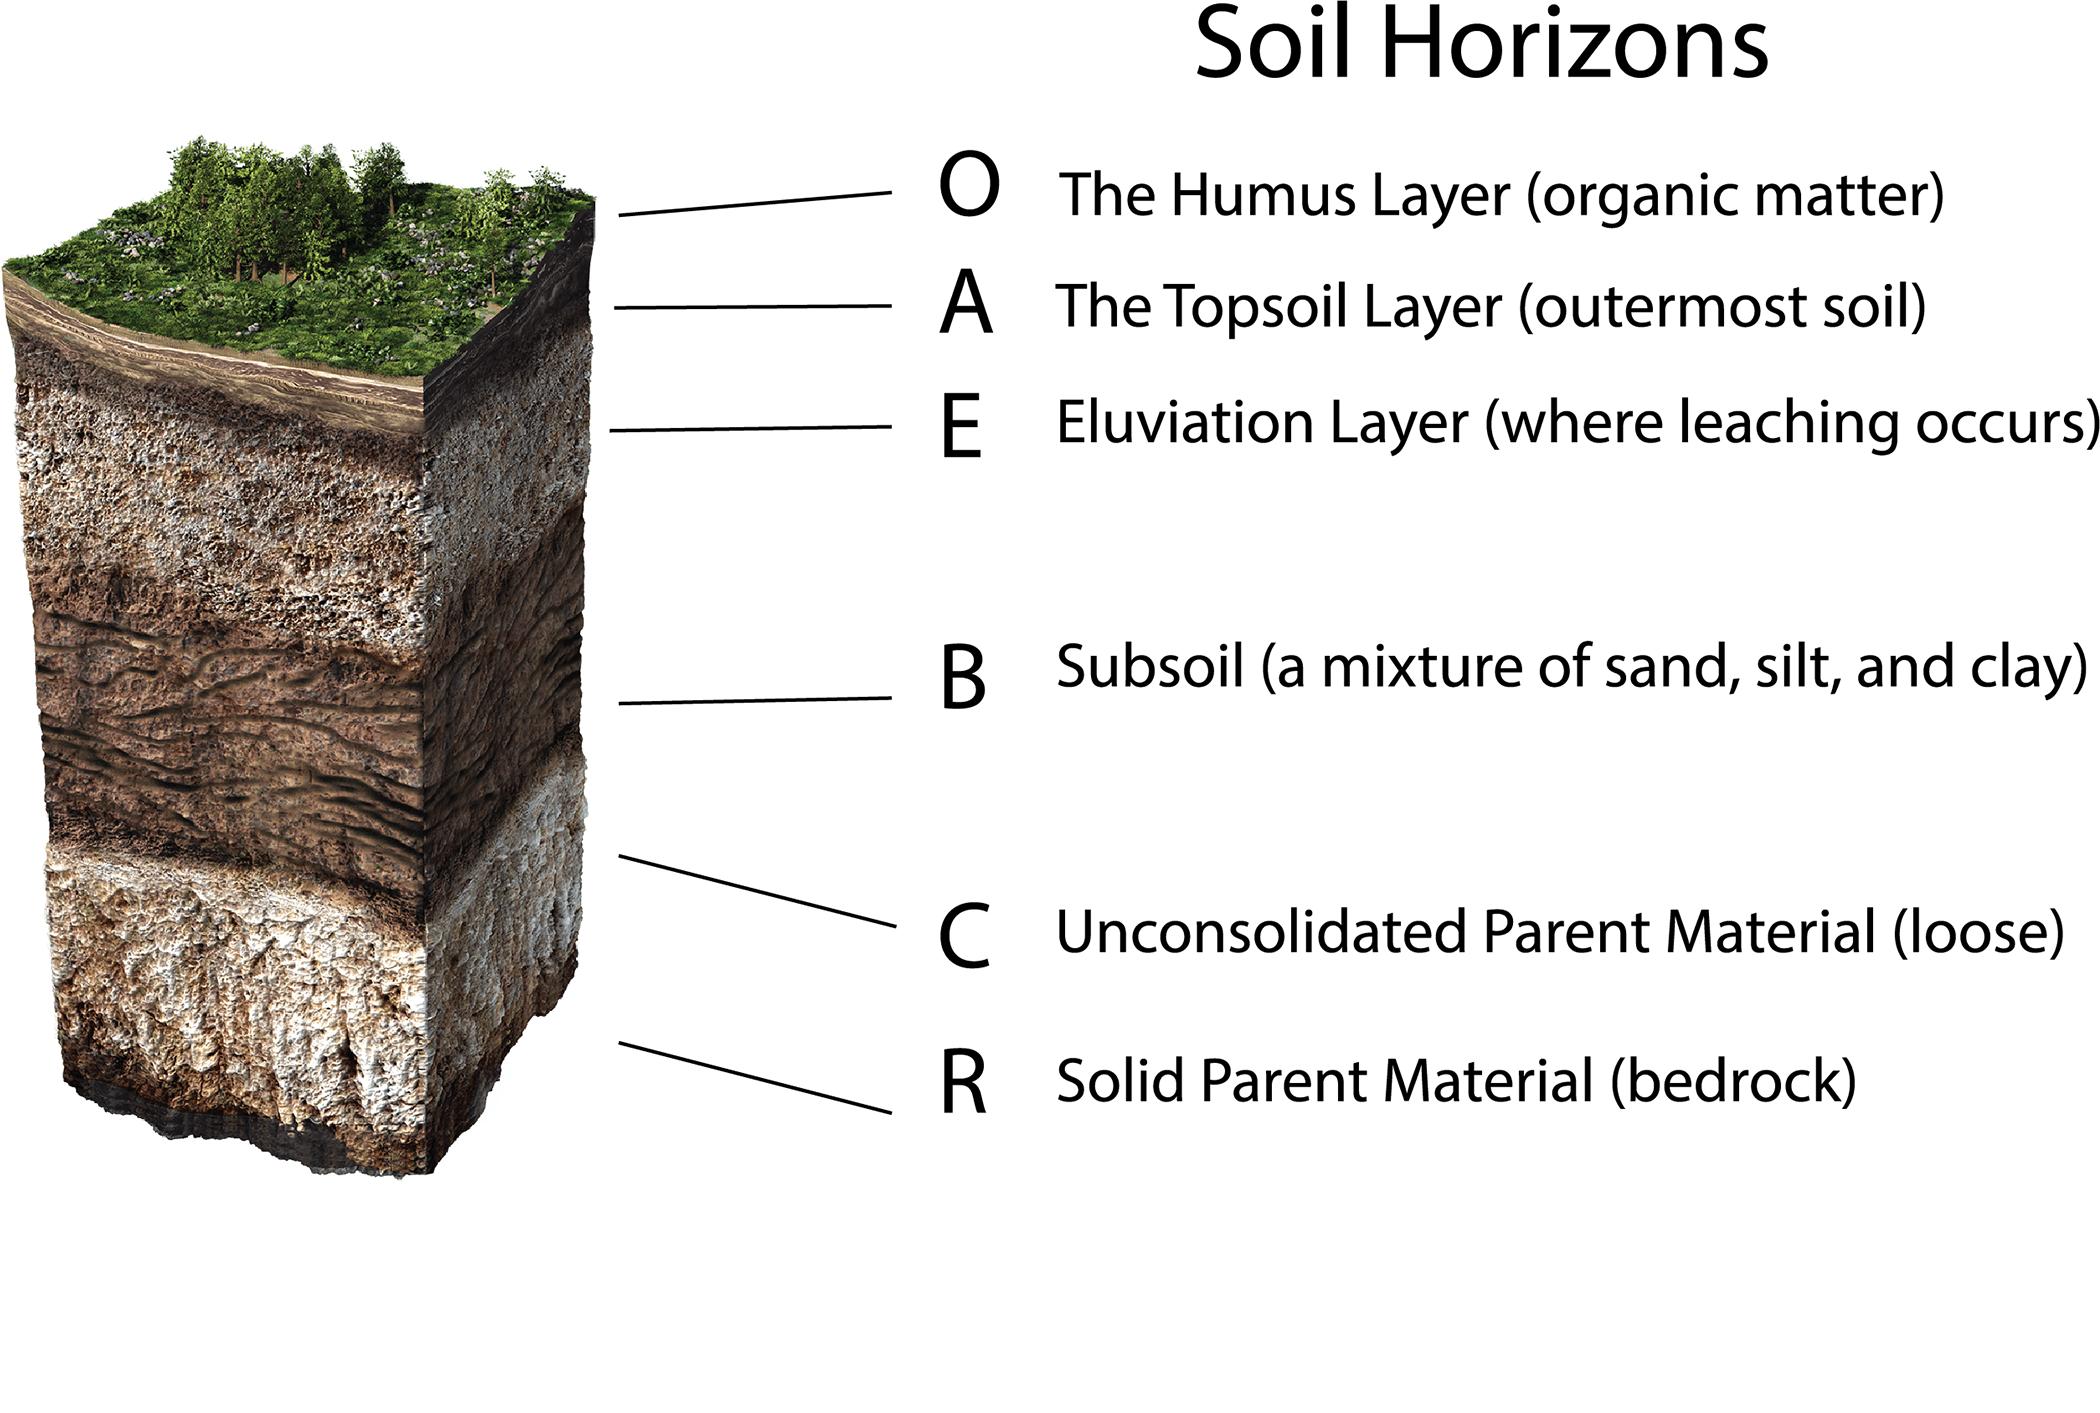 a soil profile showing the soil horizons of defining soil